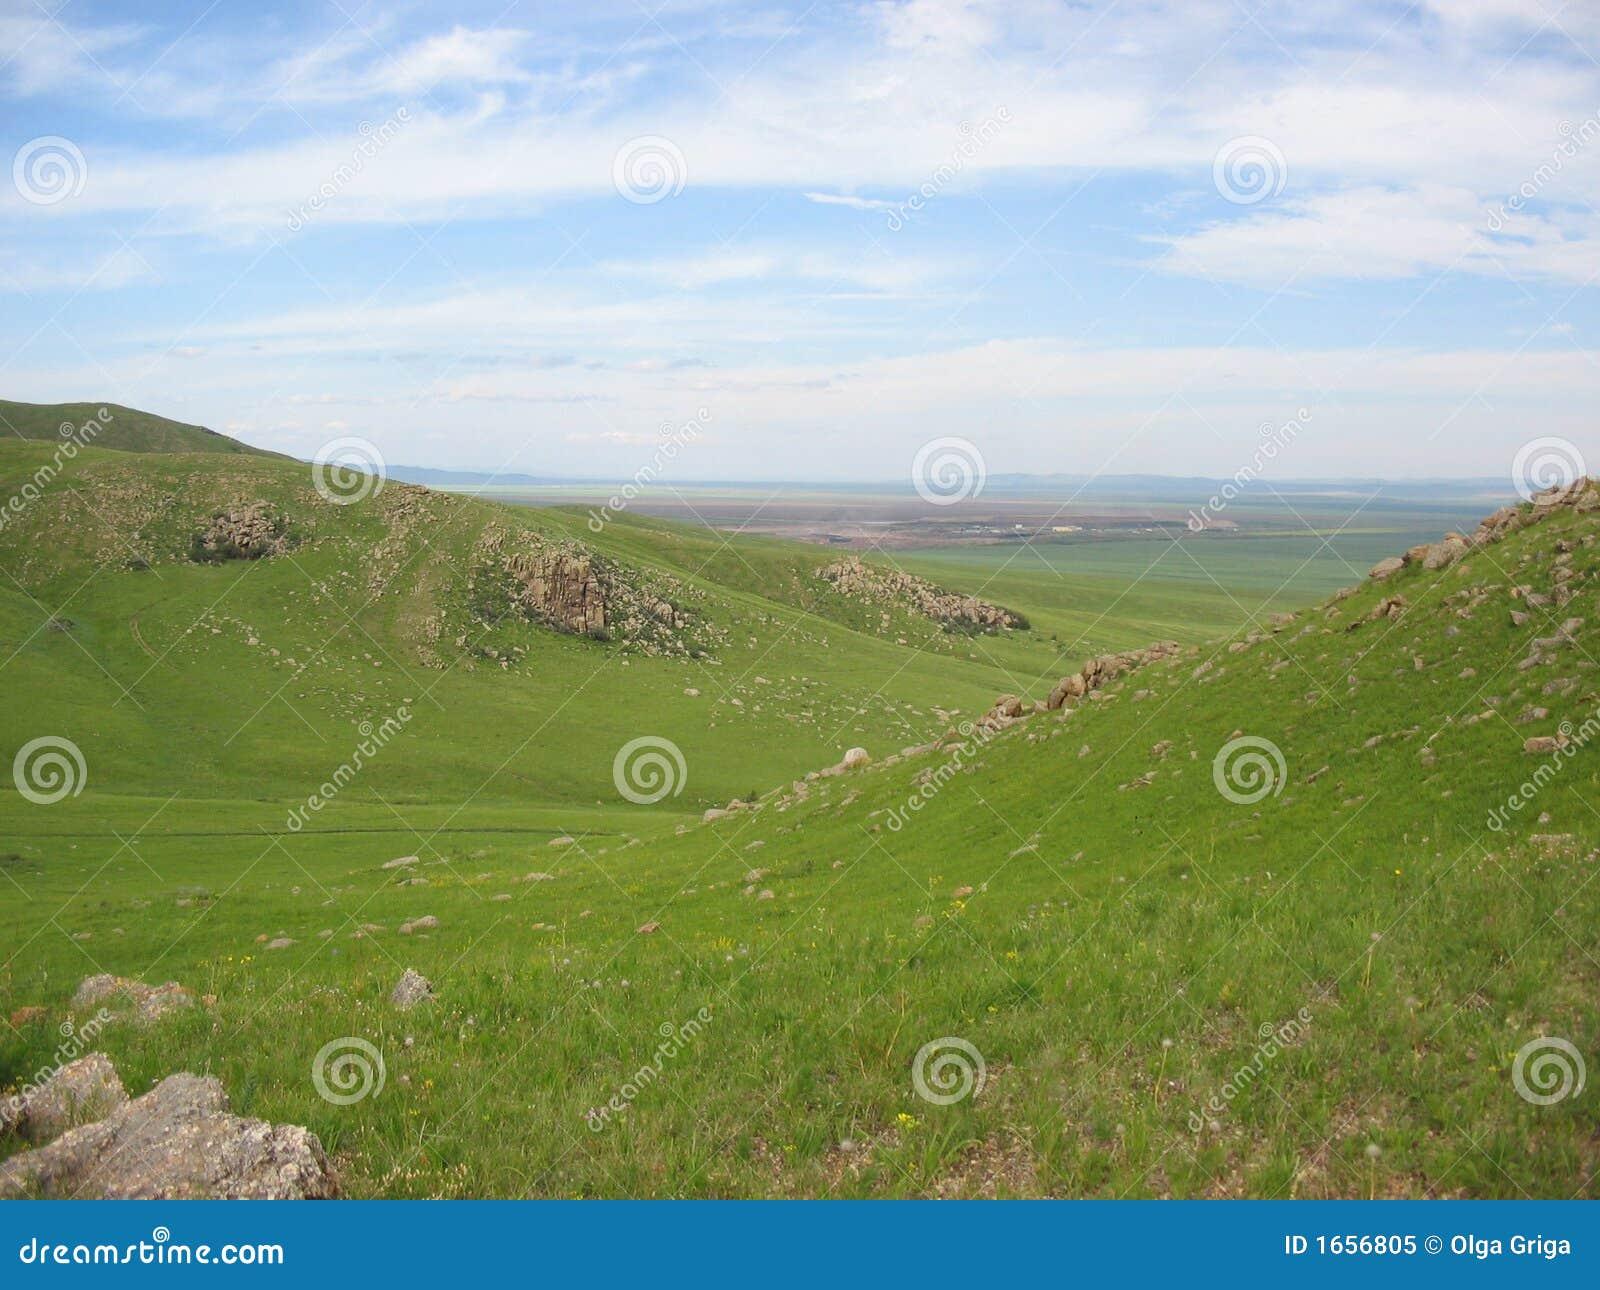 Landscape, the nature, mountain